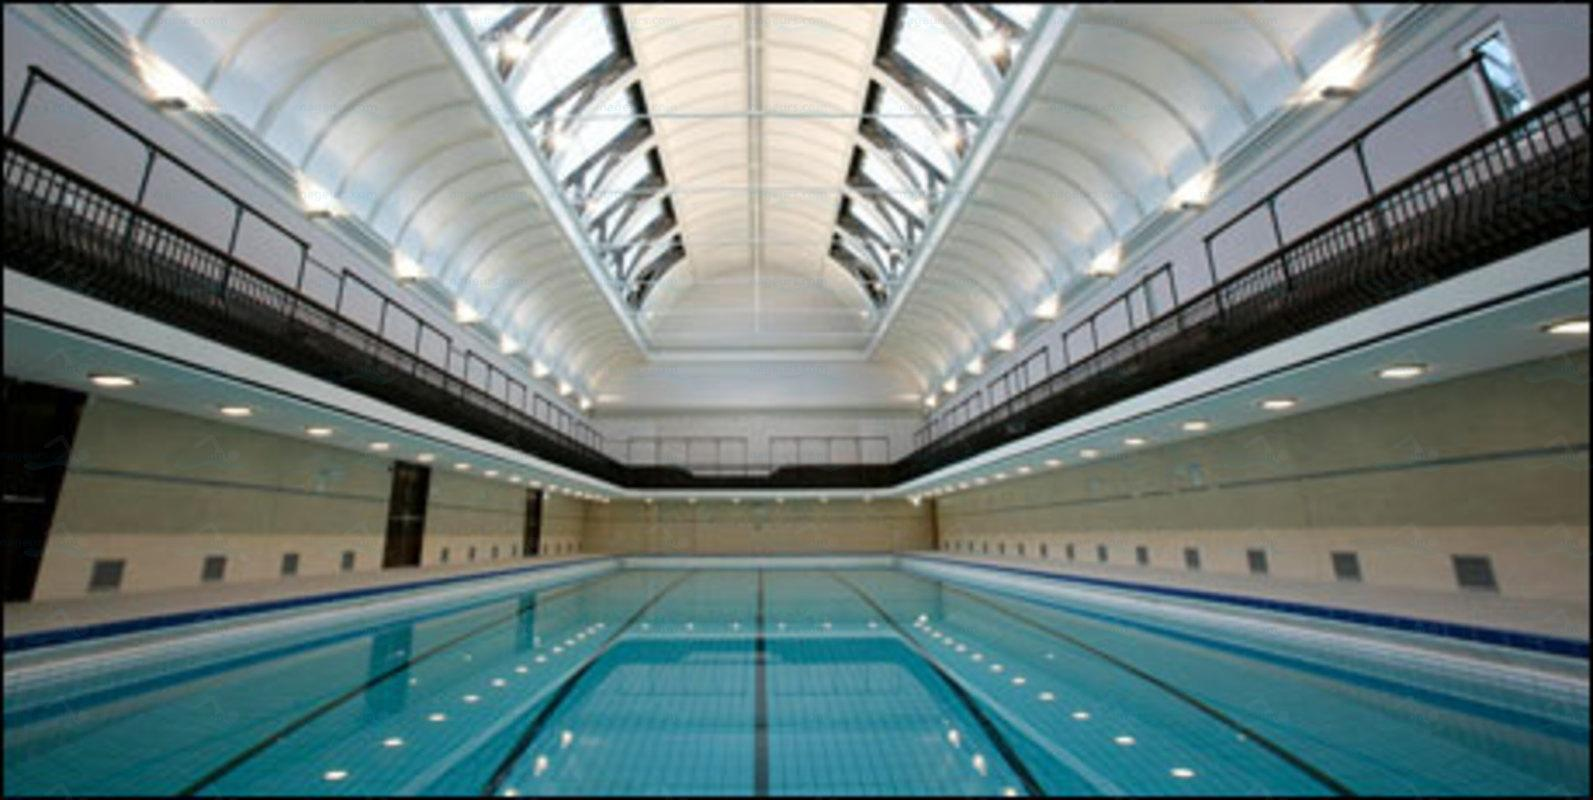 university of hertfordshire swimming pool annuaire des piscines royaume uni piscines